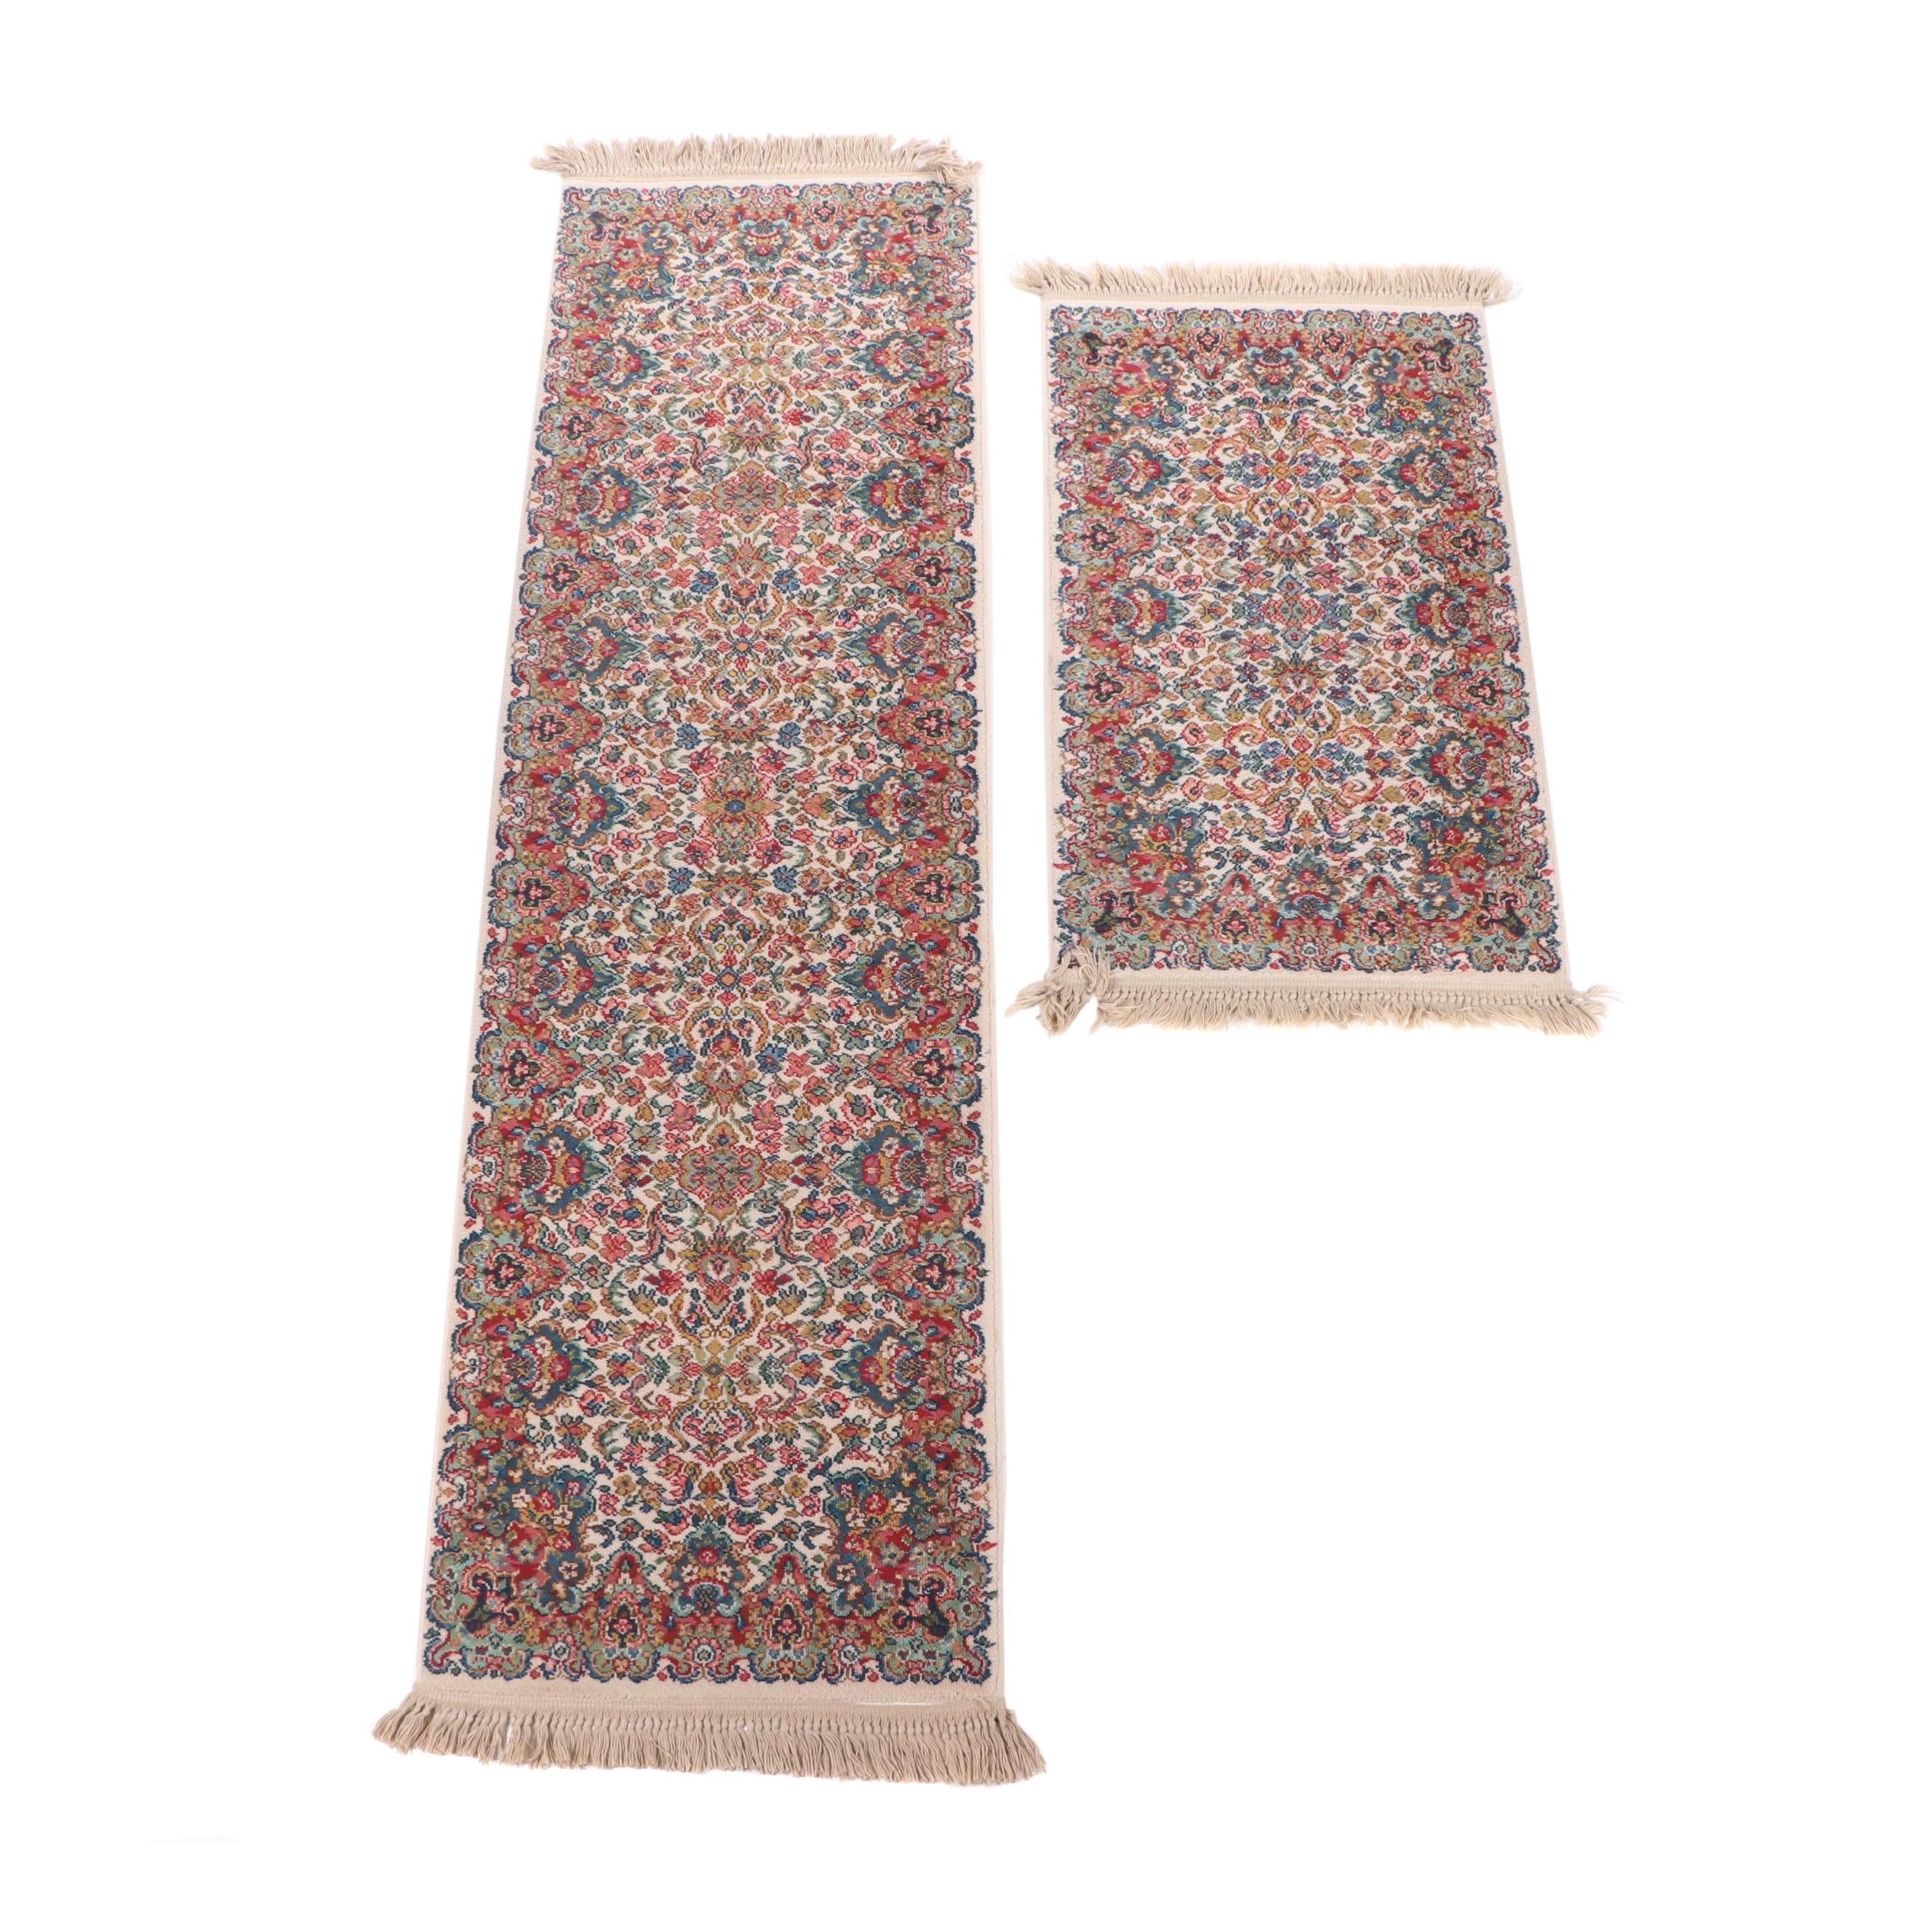 "Karastan ""Floral Kirman"" Wool Pile Carpet Runner and Accent Rug"